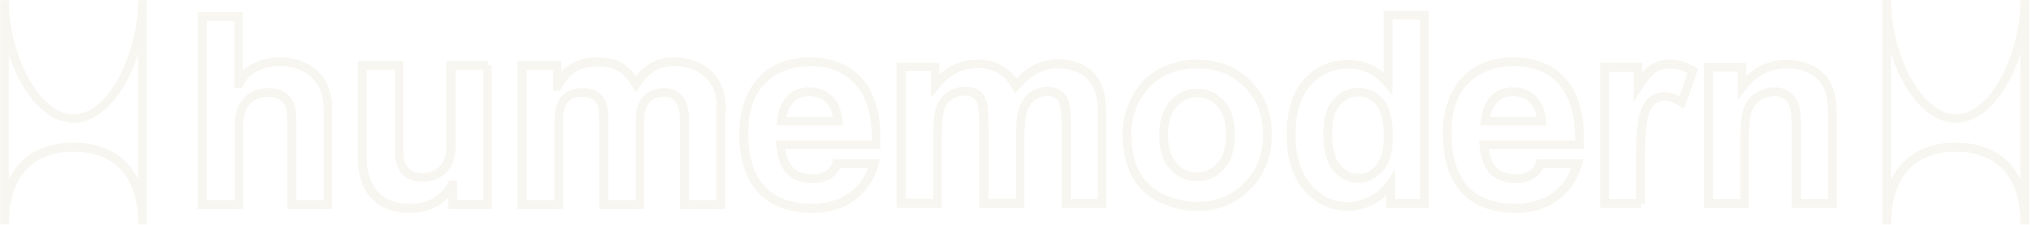 humemodern